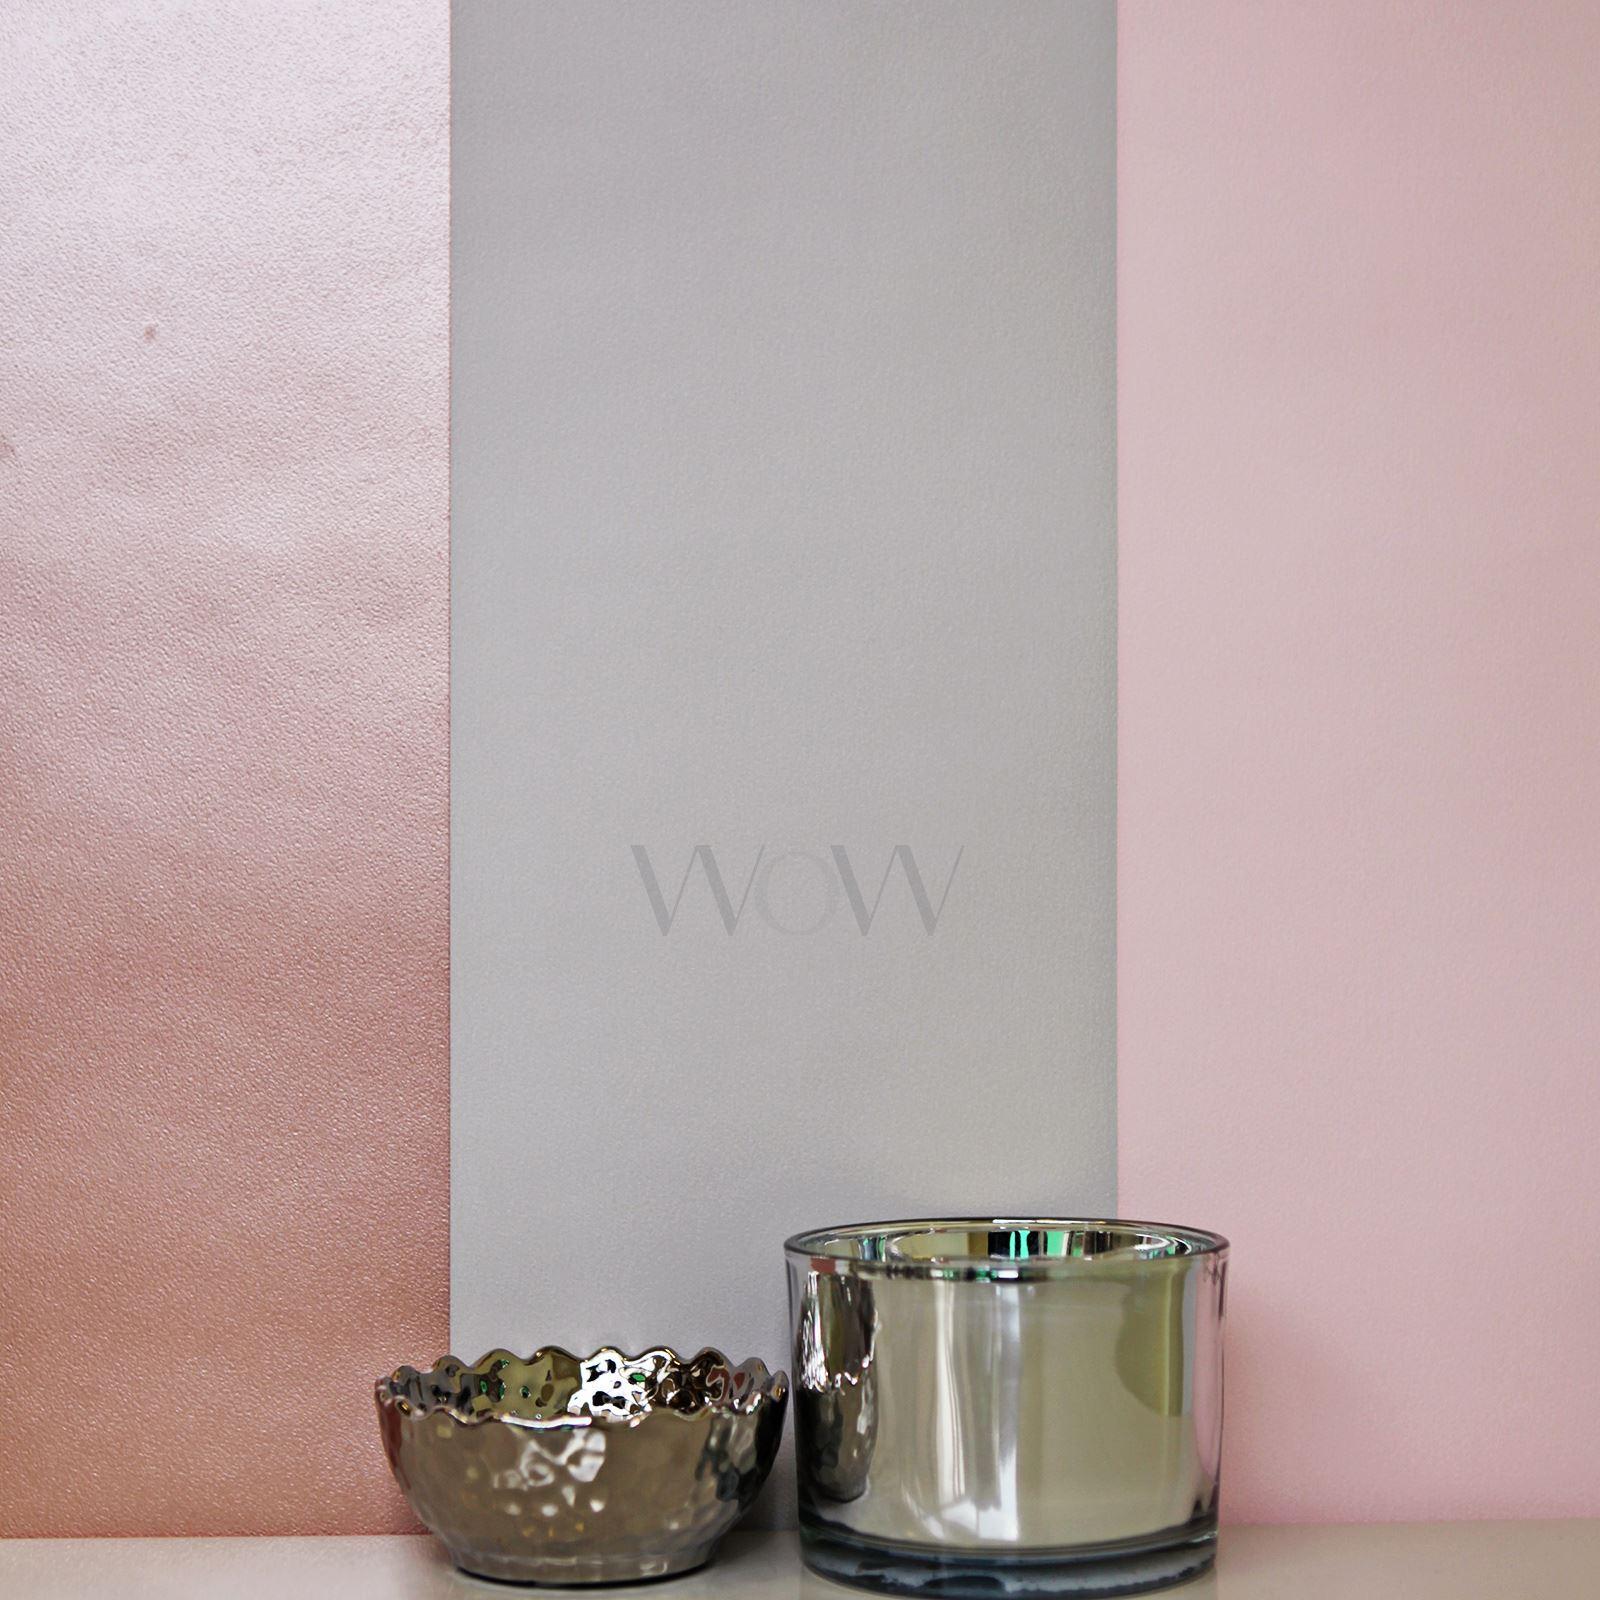 Simple Wallpaper High Quality Rose Gold - 58be4b3f-23b3-400d-a8f8-35373d256917  Graphic_74169.jpg